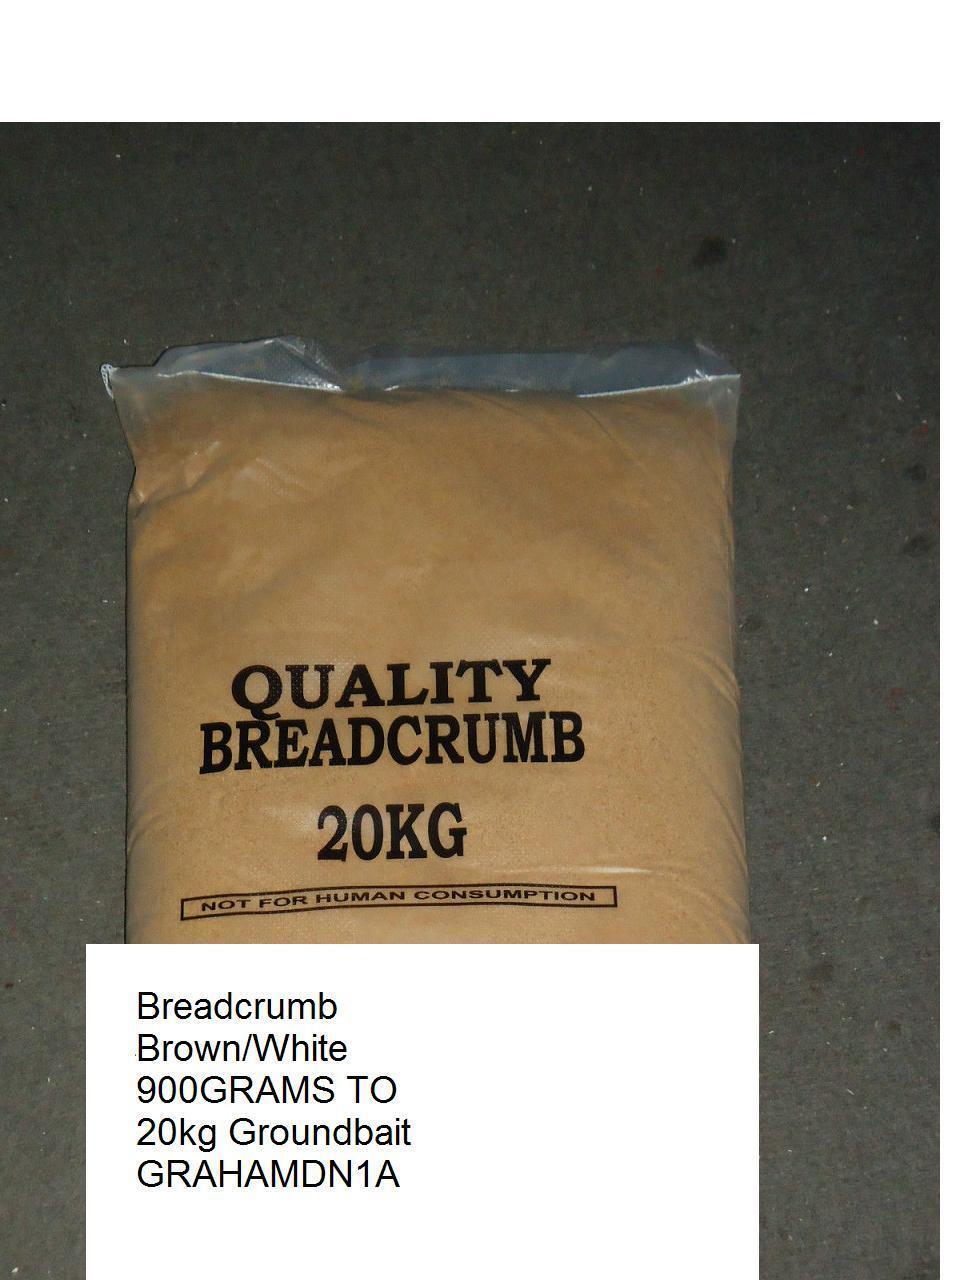 BREADCRUMB,FINE,WHITE,BROWN, RED 1.8kg 180k Groundbait,COARSE FISHING,BAIT